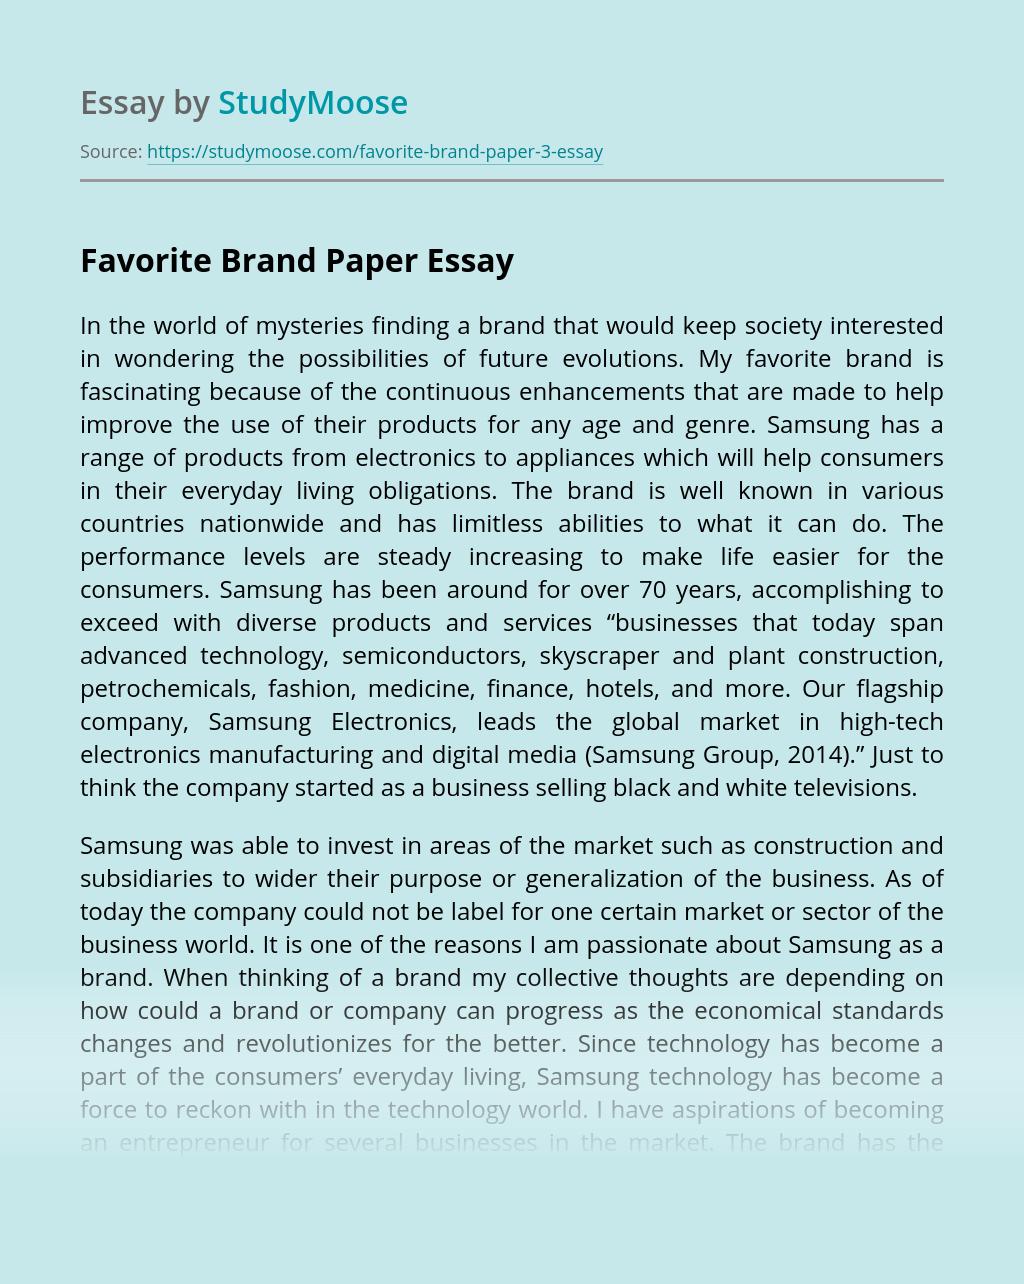 Favorite Brand Paper